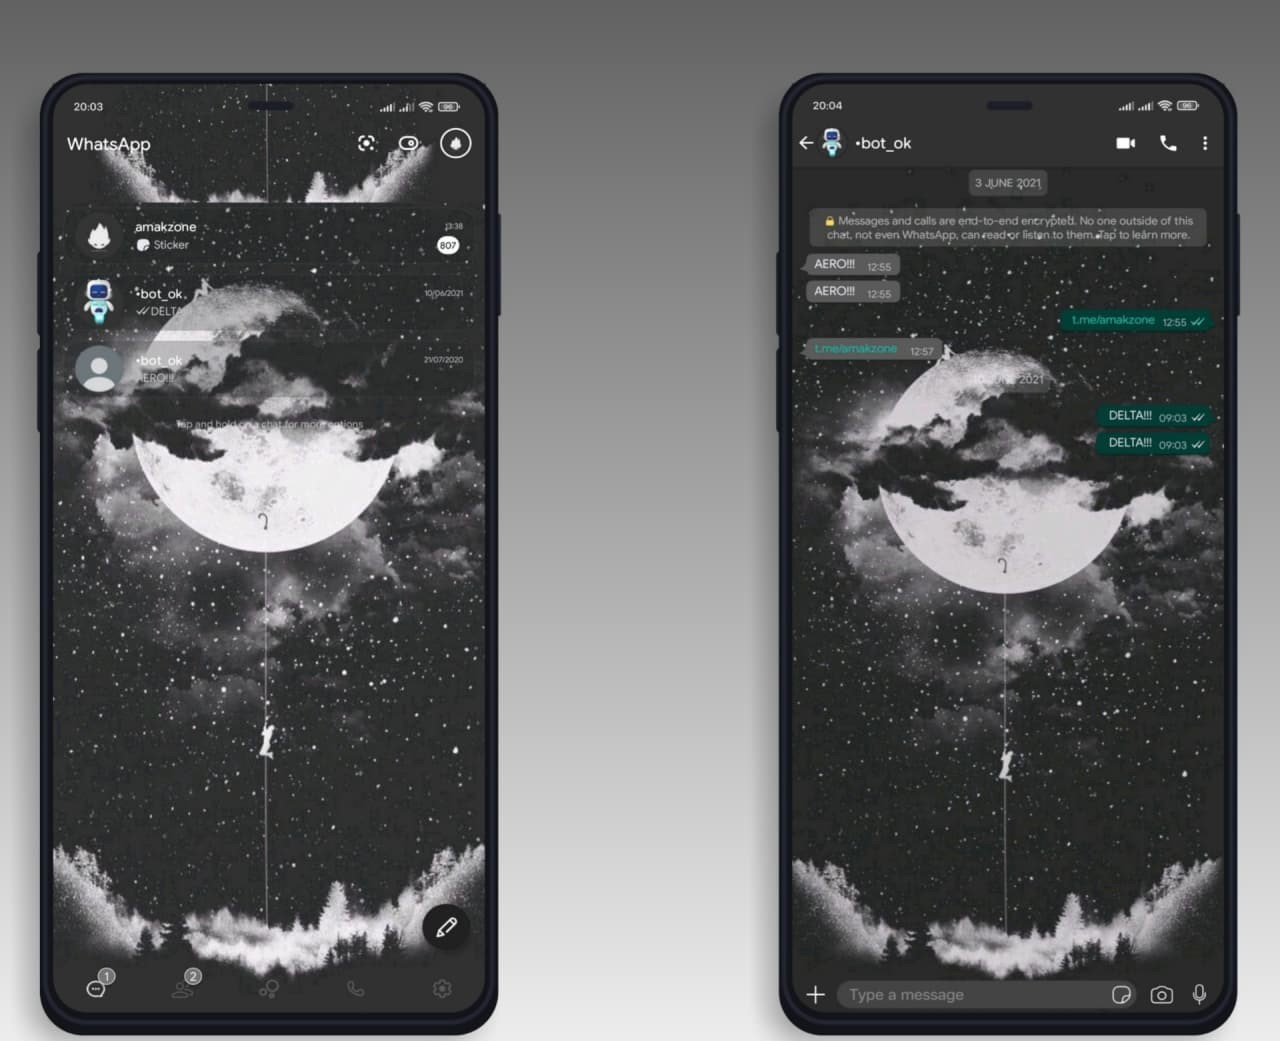 Night Mod Moon Theme For YOWhatsApp & Delta WhatsApp By Amakzone ...